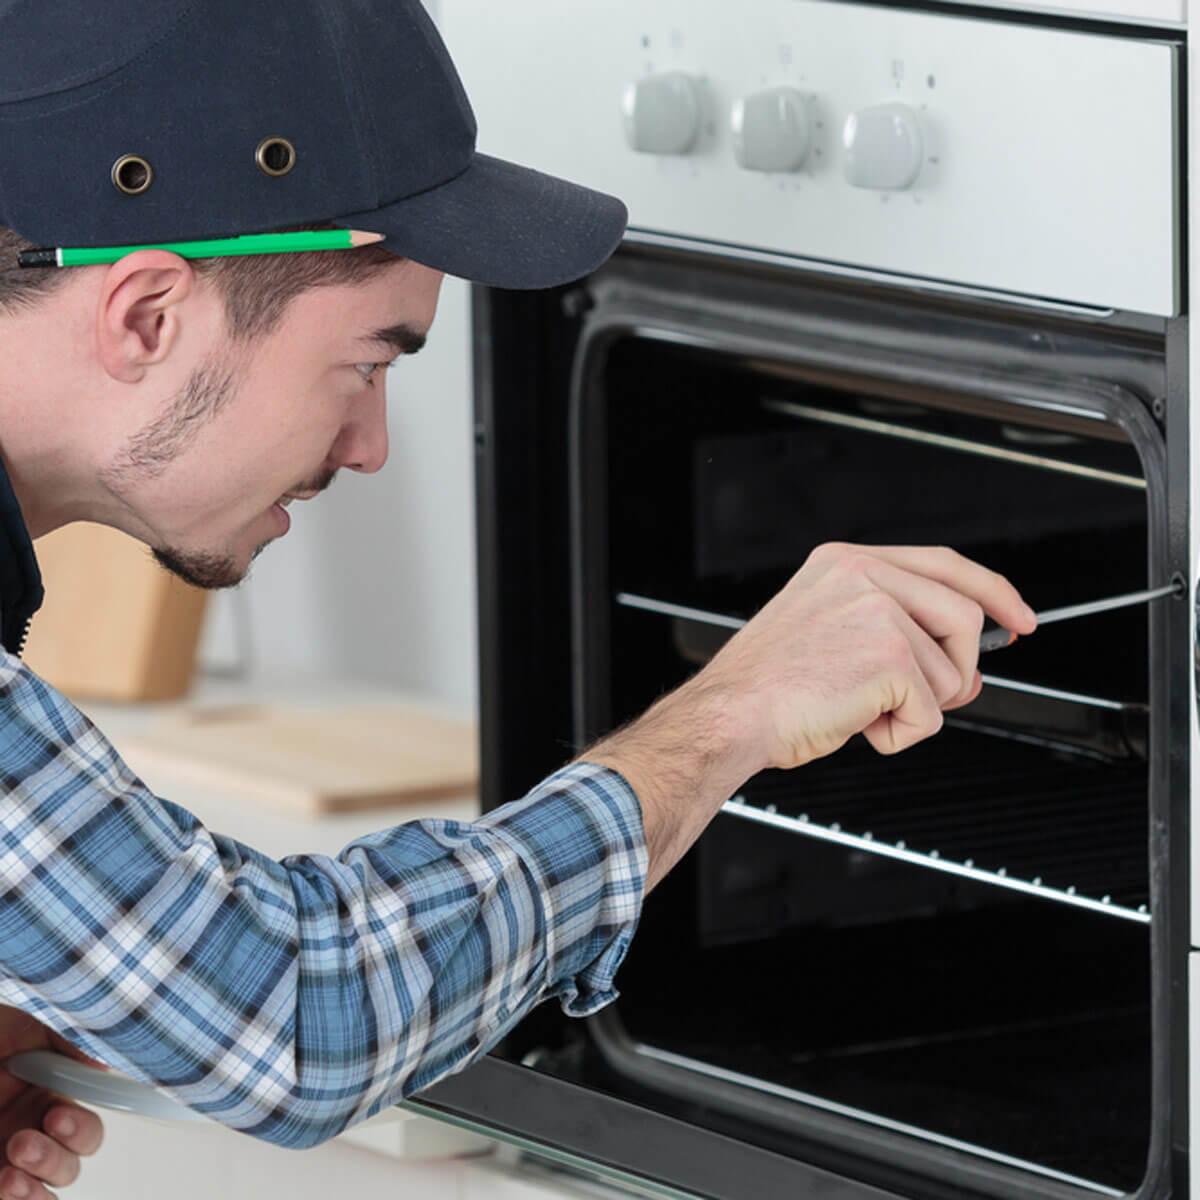 7 tips for repairing household appliances